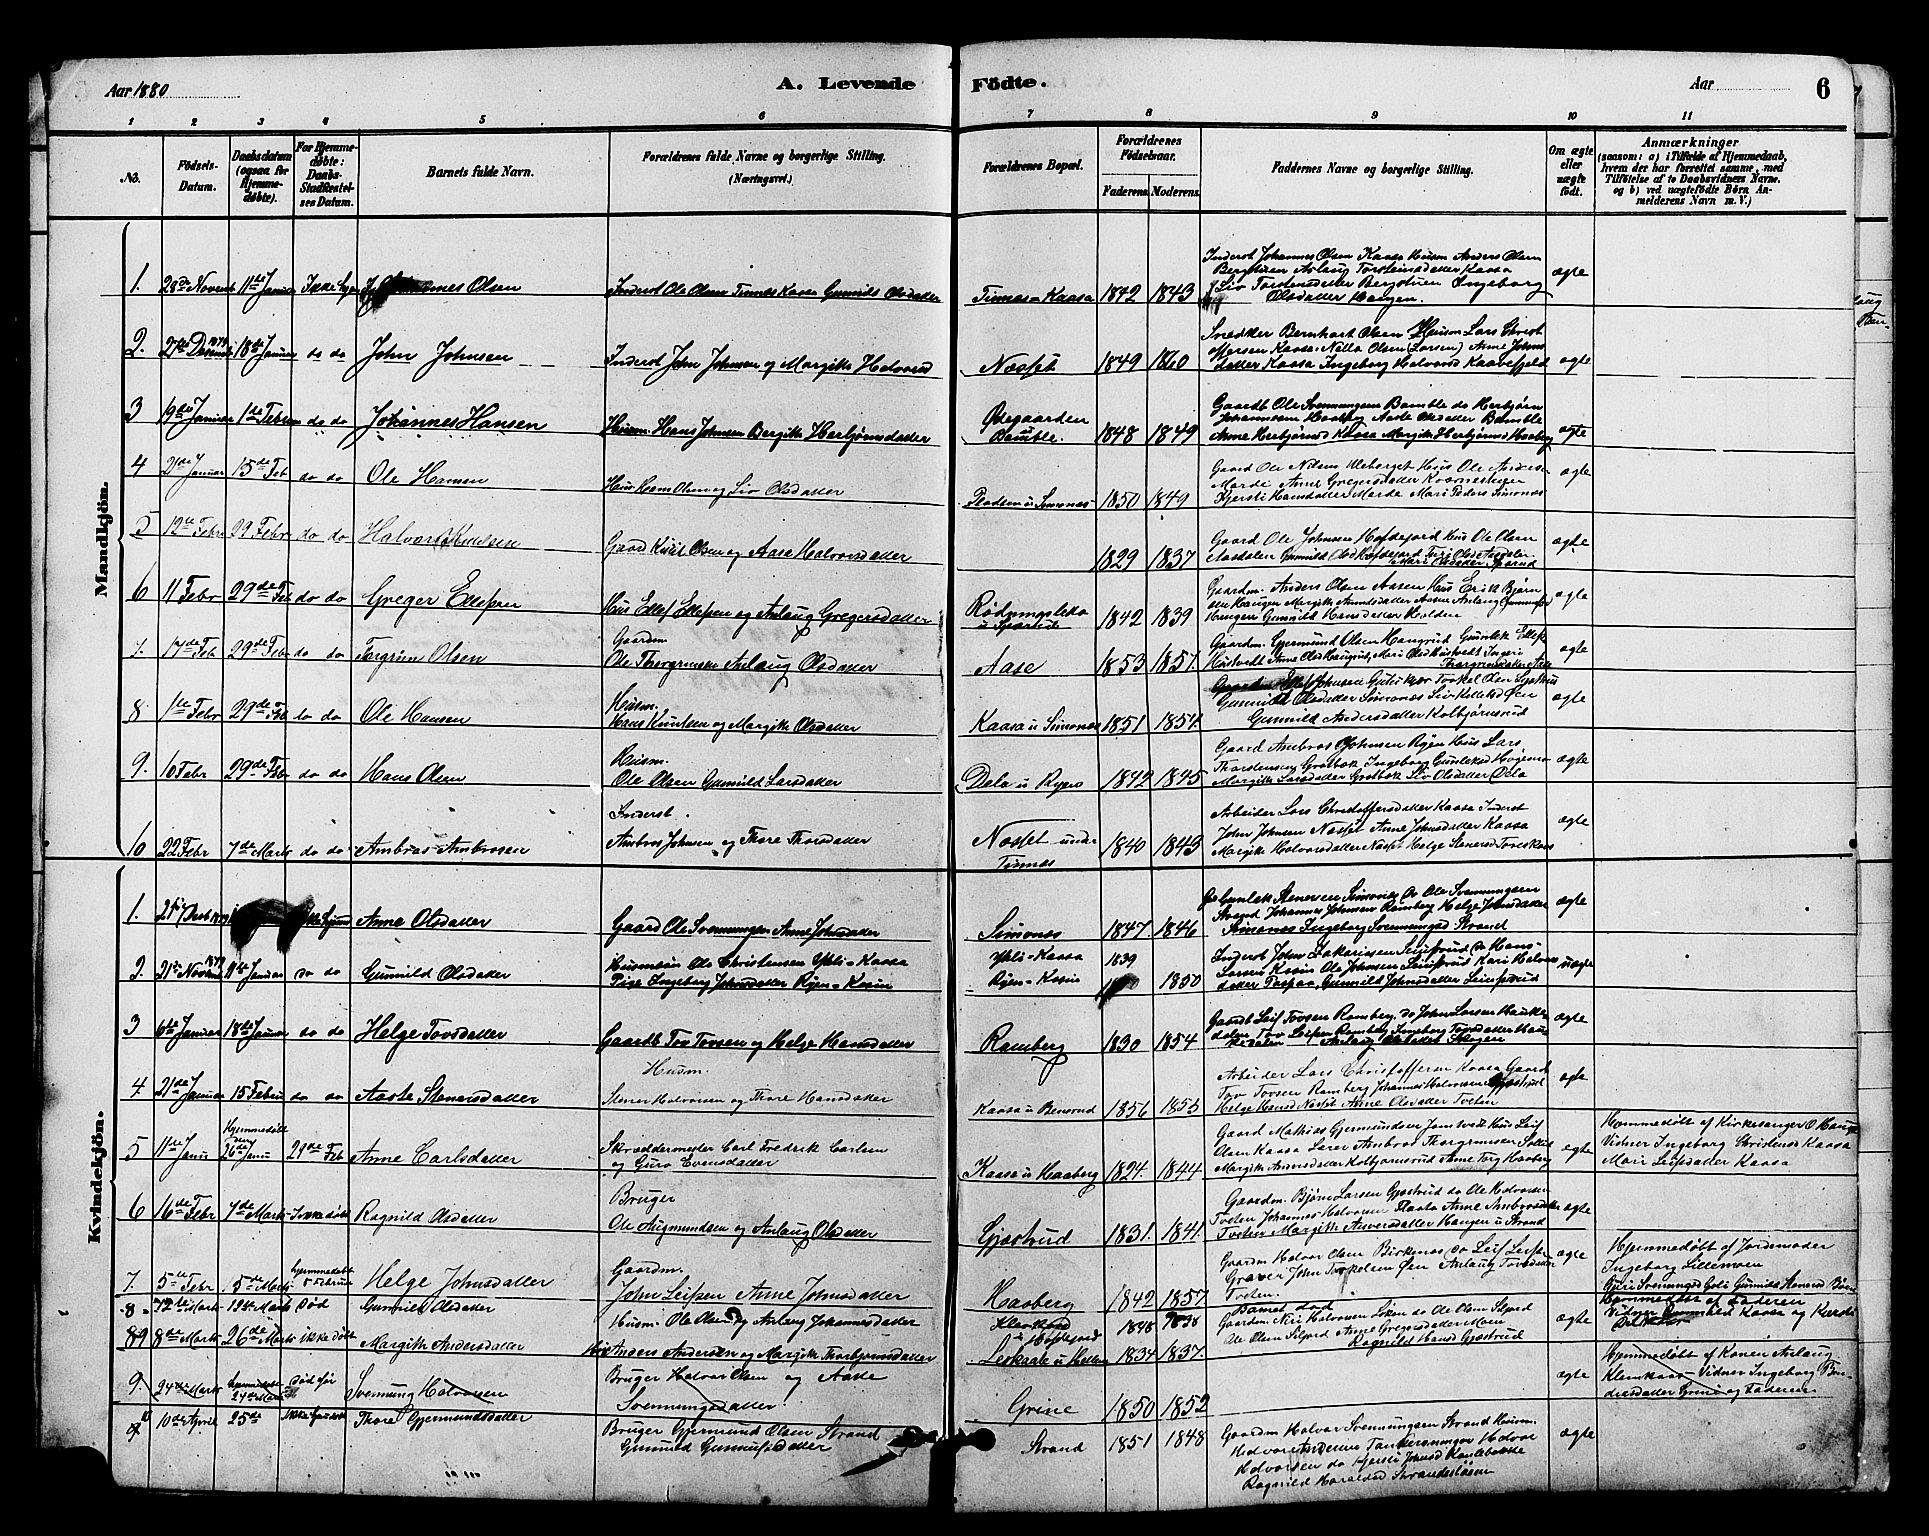 SAKO, Heddal kirkebøker, G/Ga/L0002: Klokkerbok nr. I 2, 1879-1908, s. 6